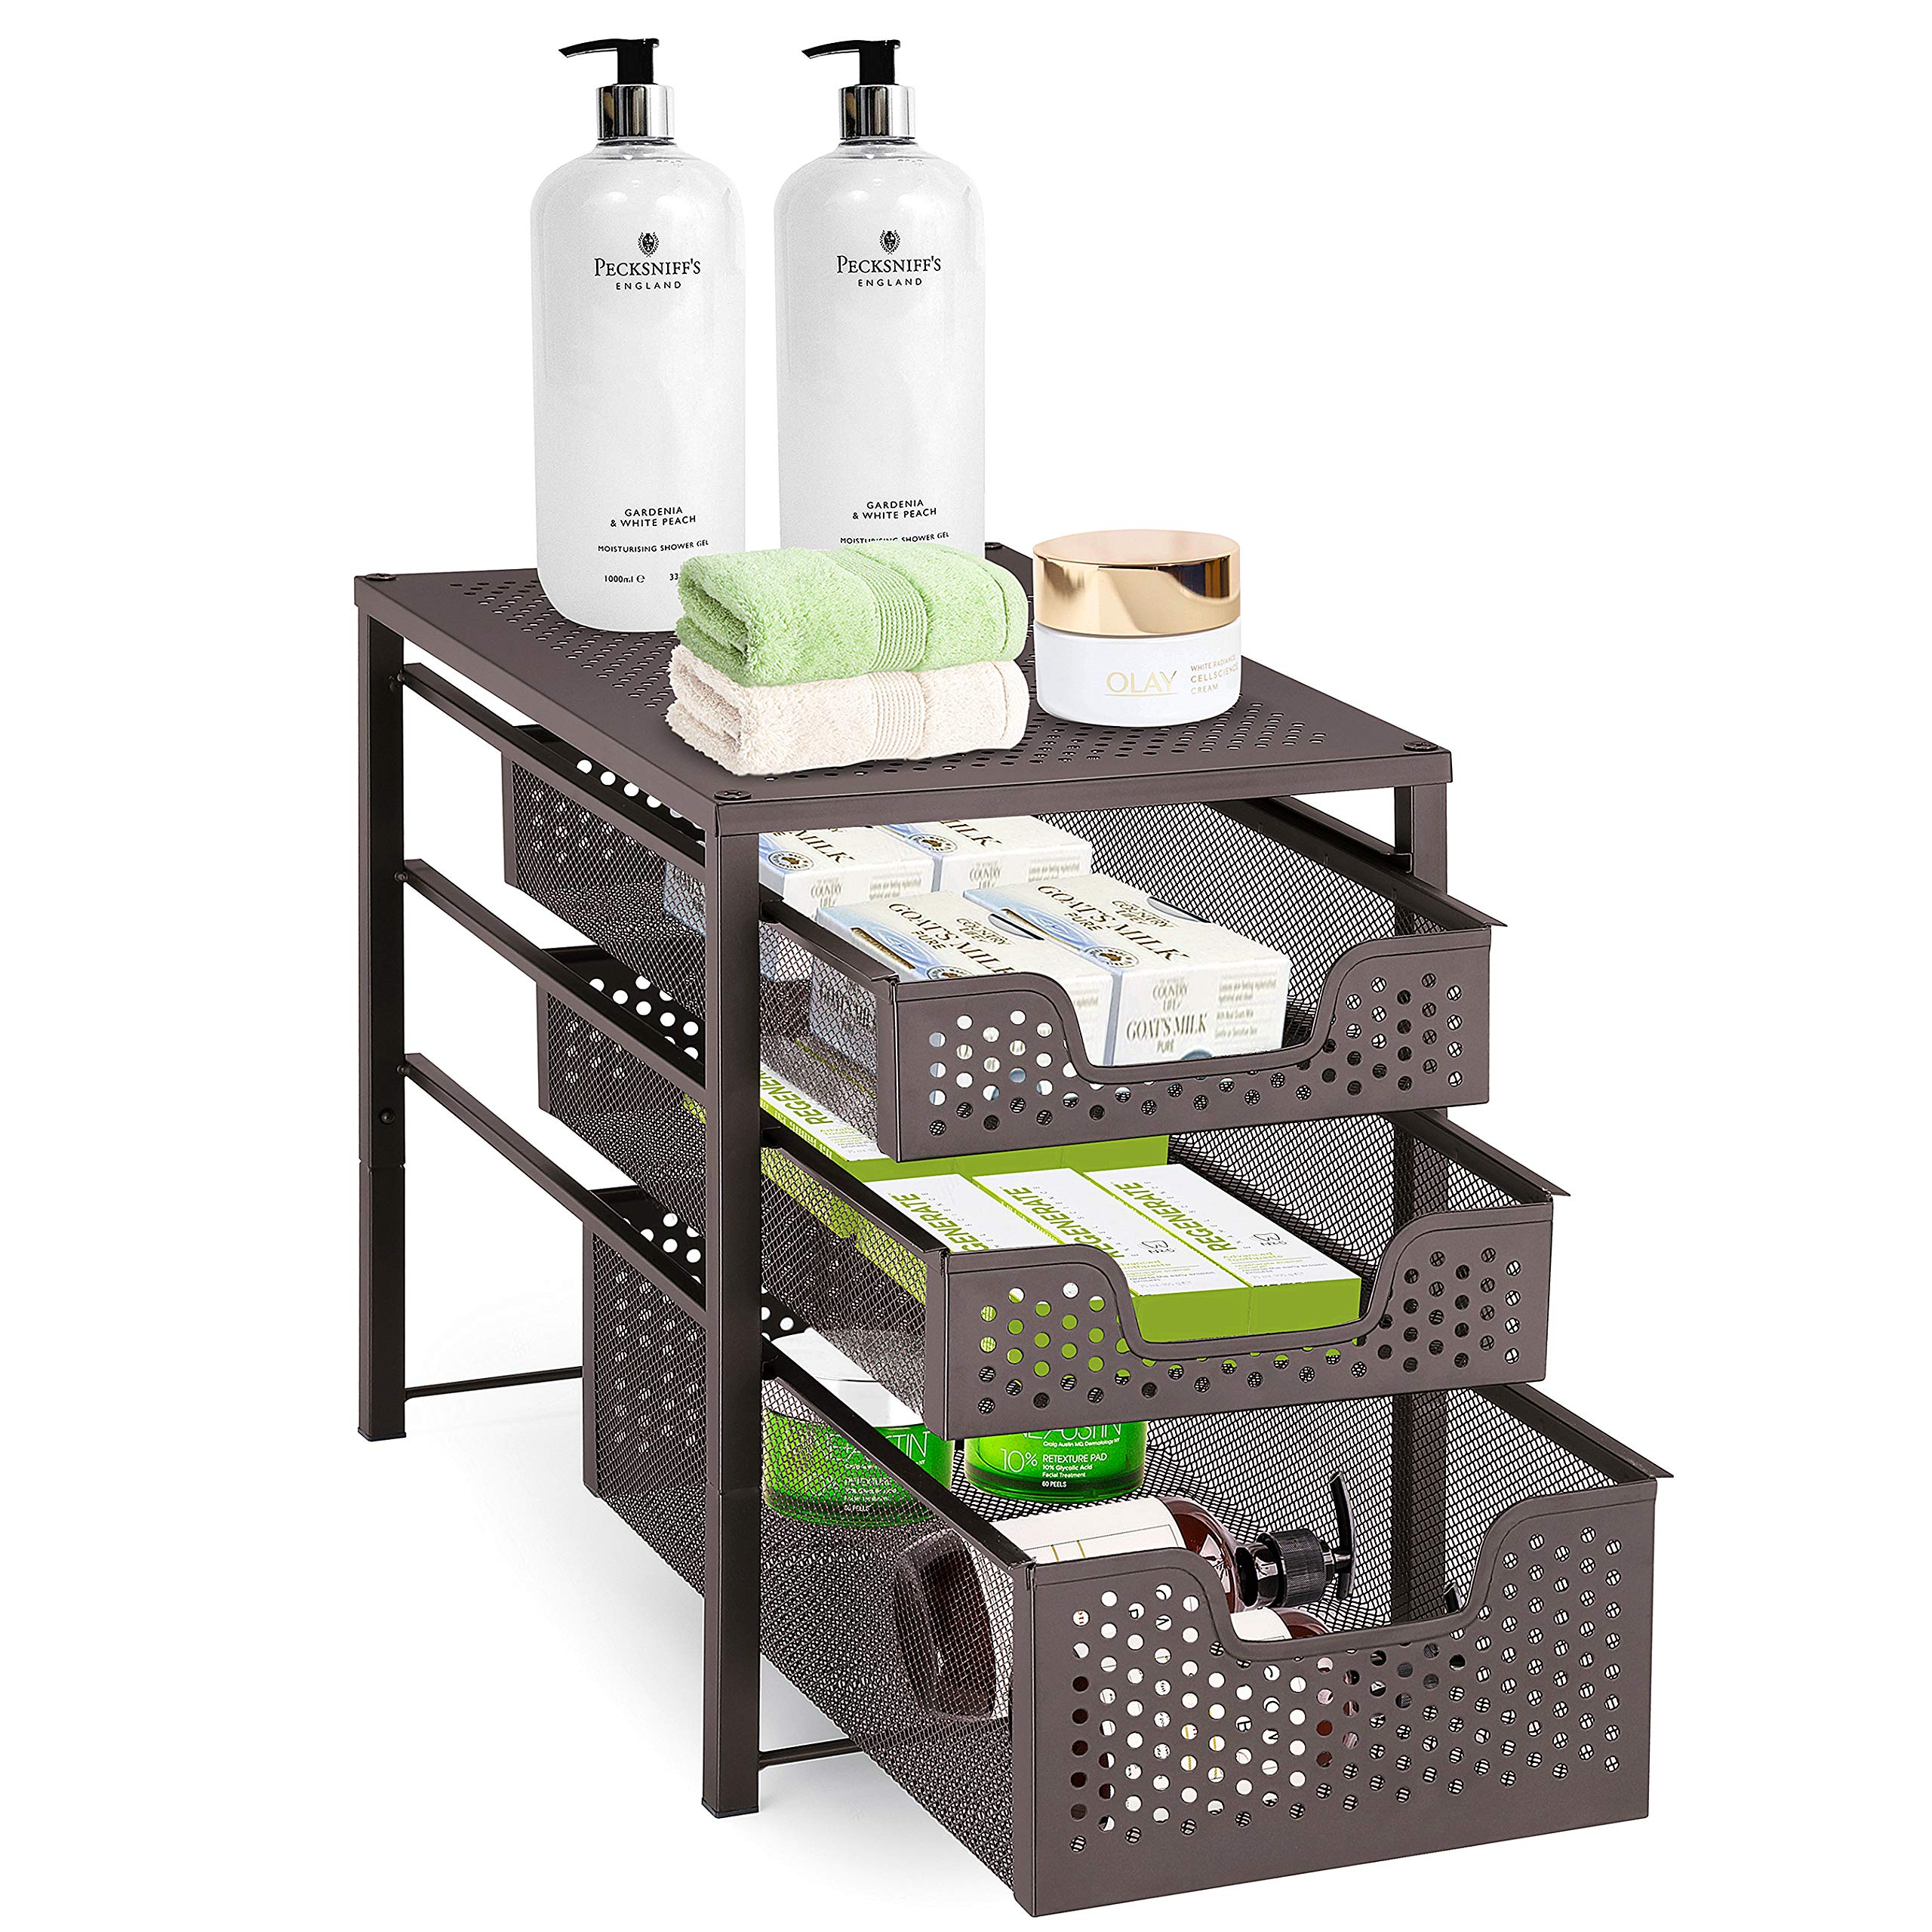 Simple Trending 3-Tier Under Sink Cabinet Organizer with Sliding Storage Drawer, Desktop Organizer for Kitchen Bathroom Office, Stackbale, Bronze by Simple Trending